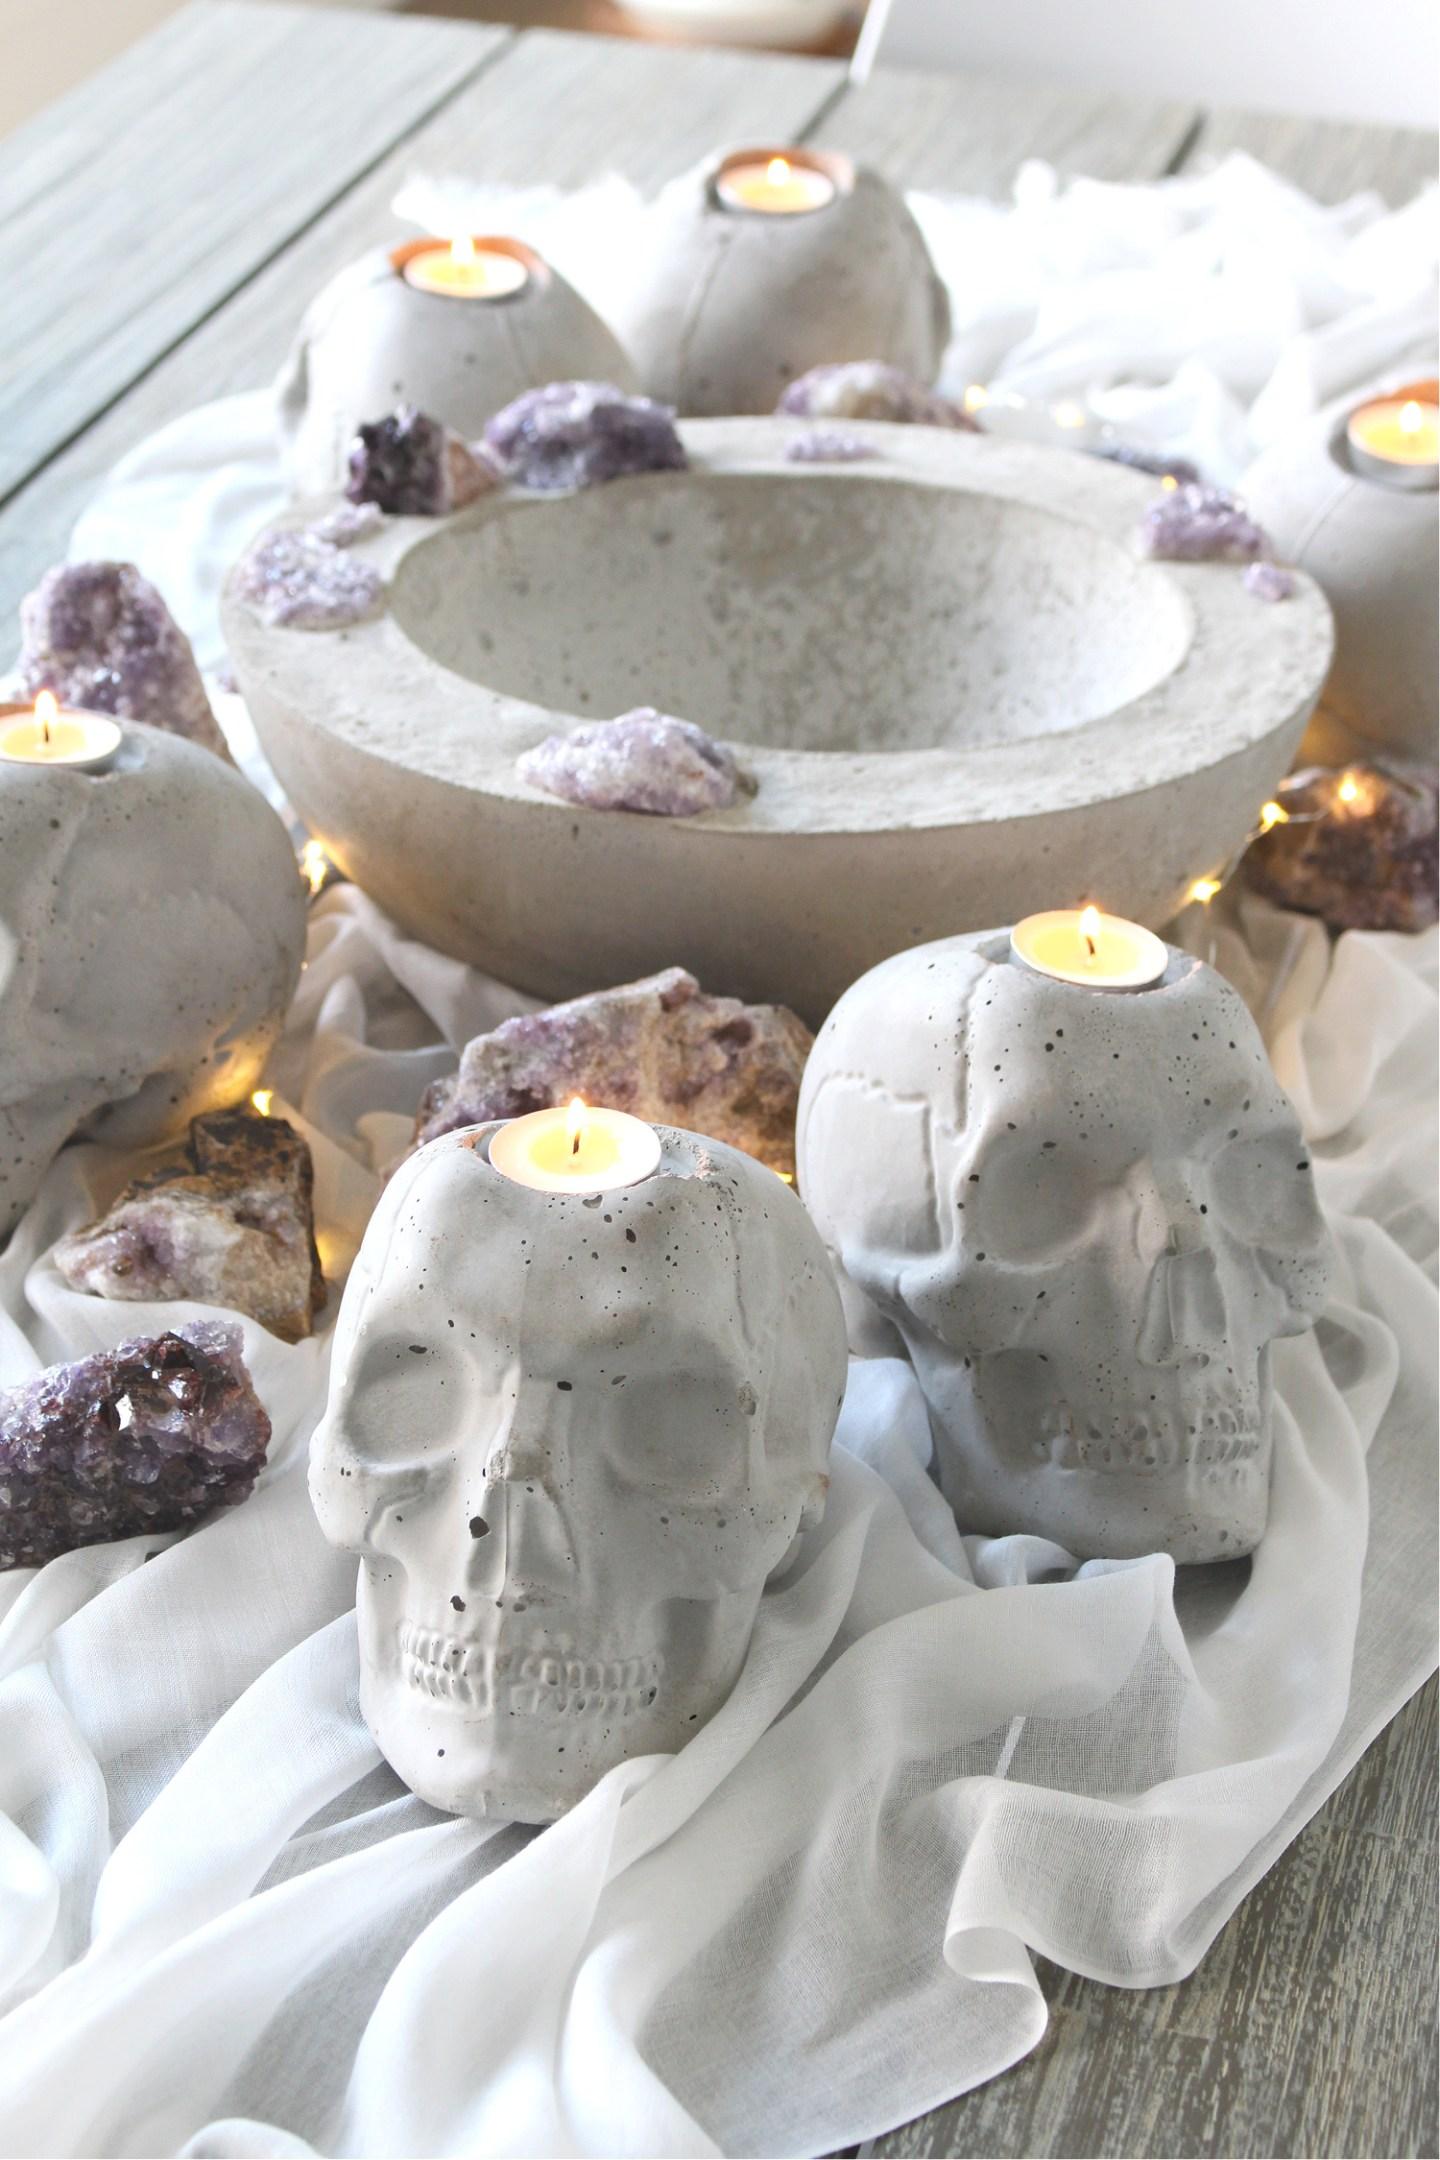 DIY Concrete Skull Candle Holder Tutorial